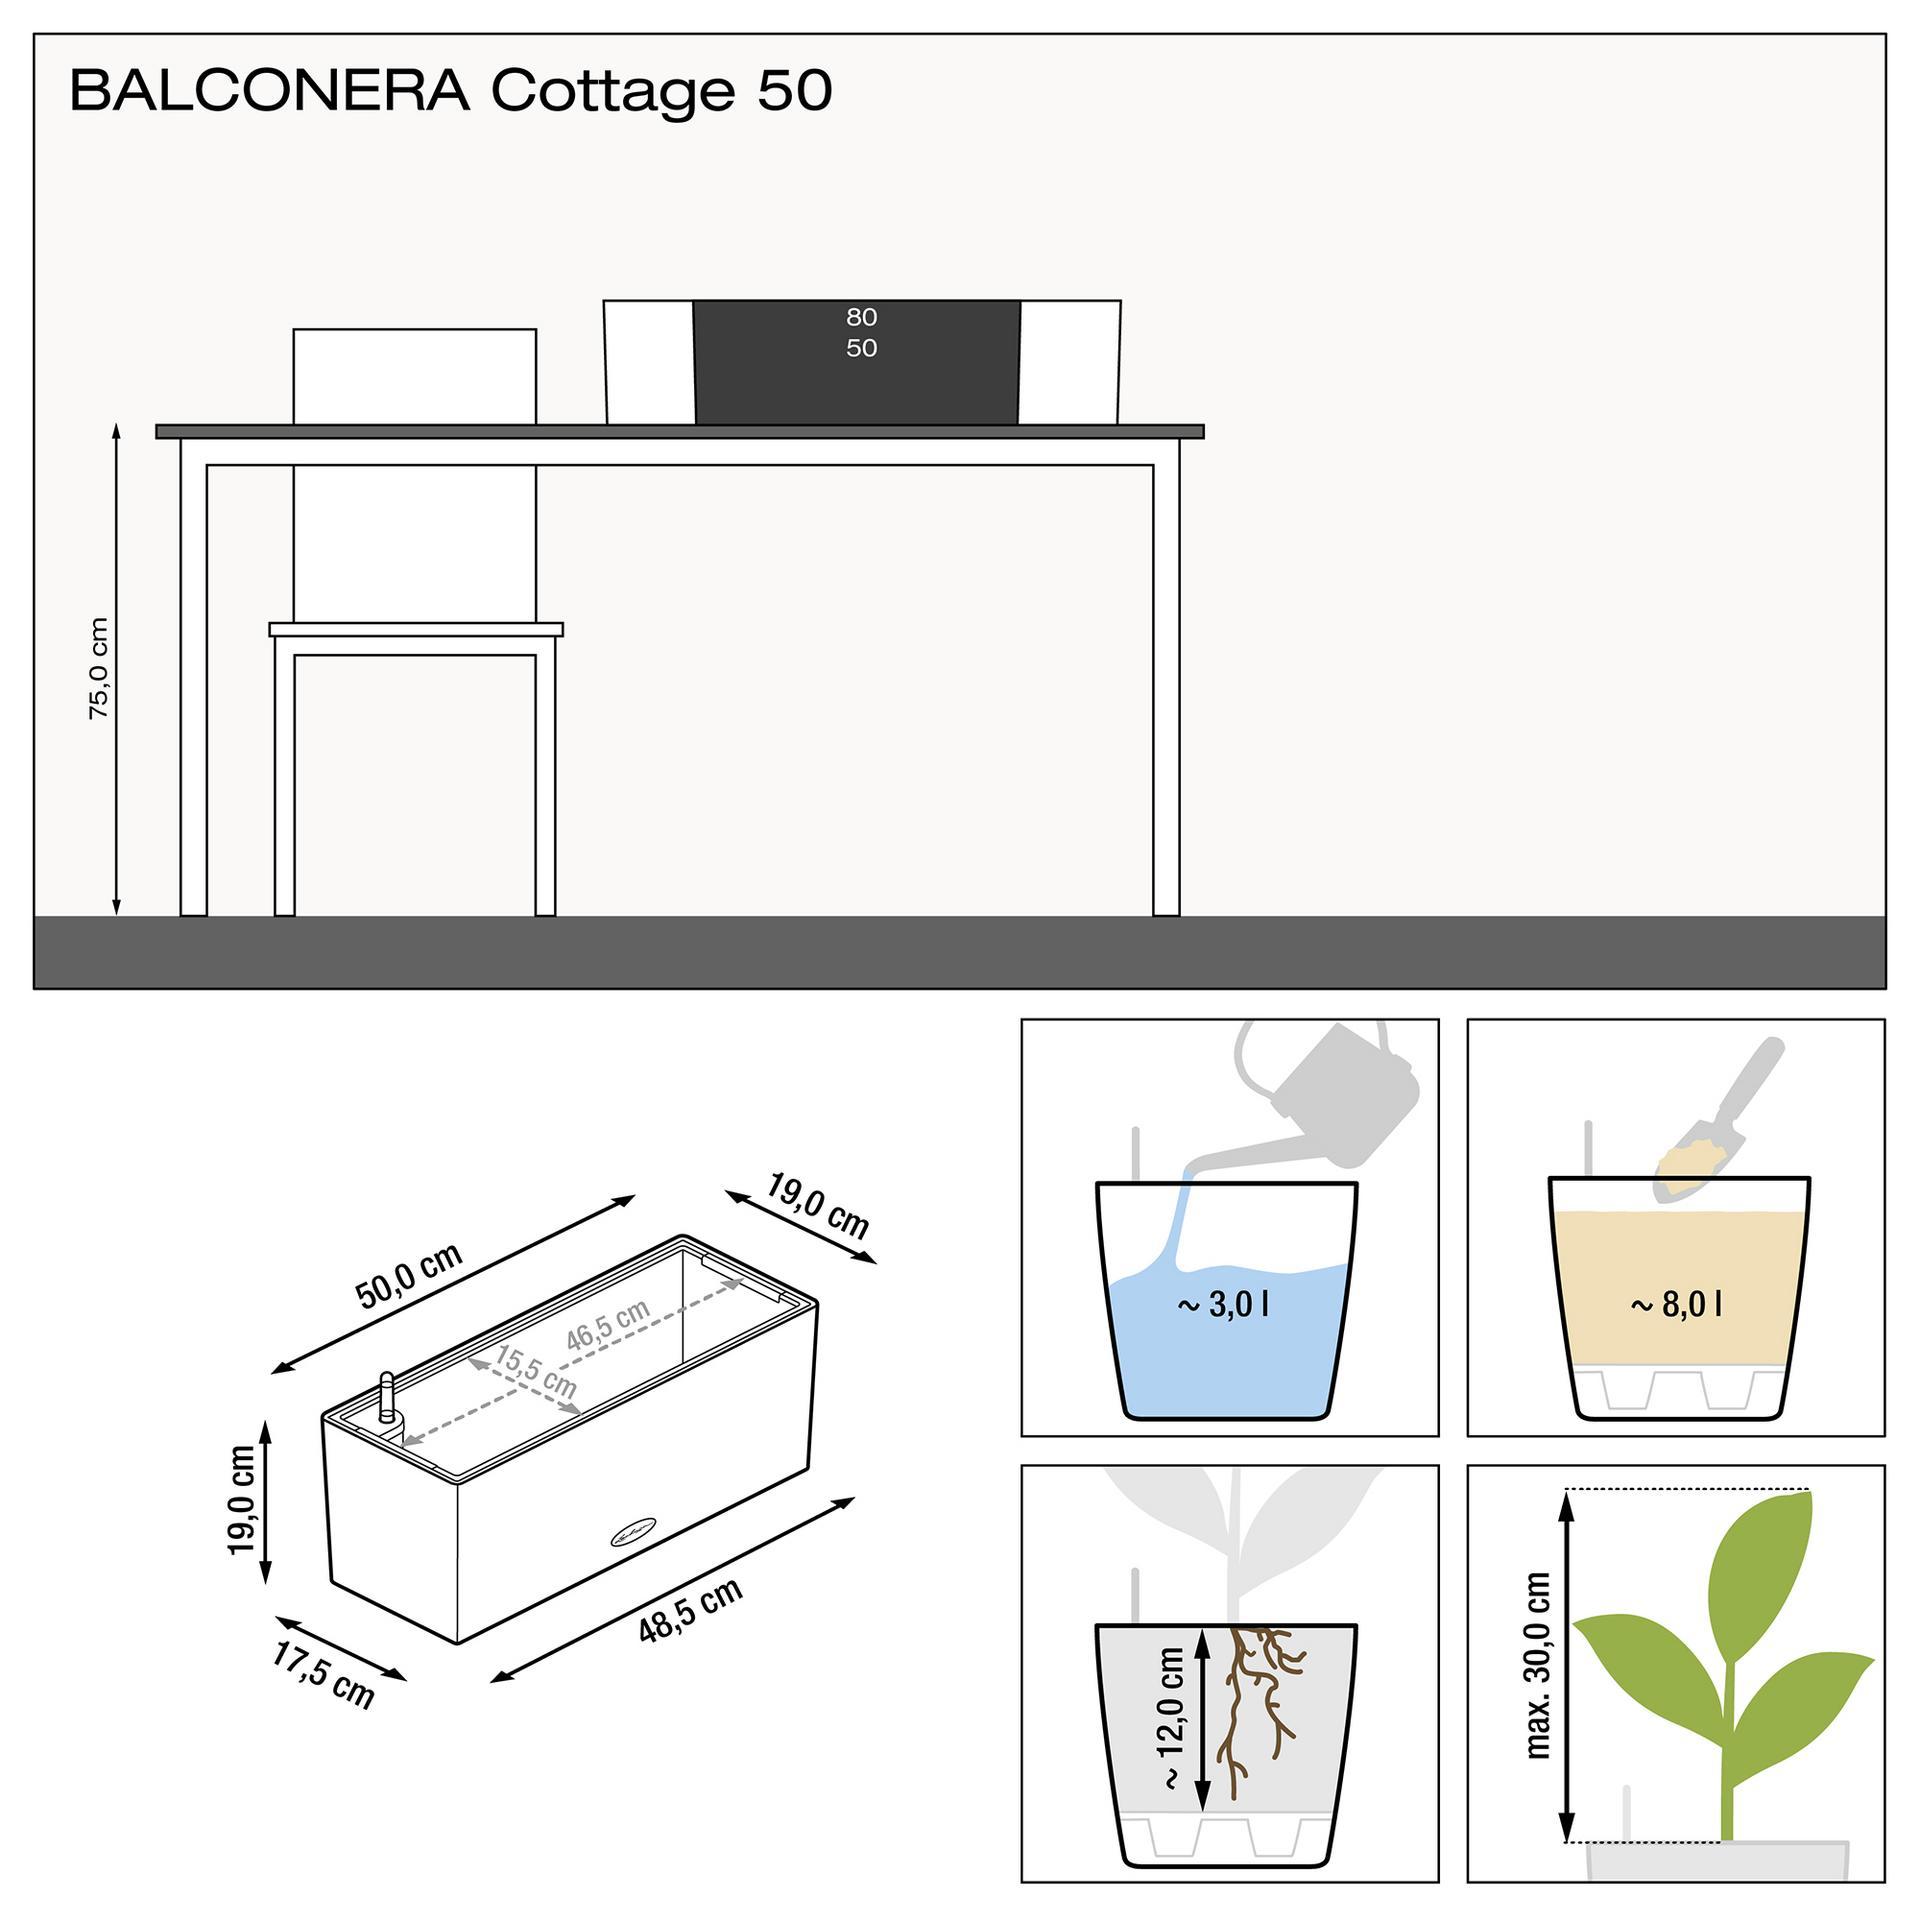 le_balconera-cottage50_product_addi_nz